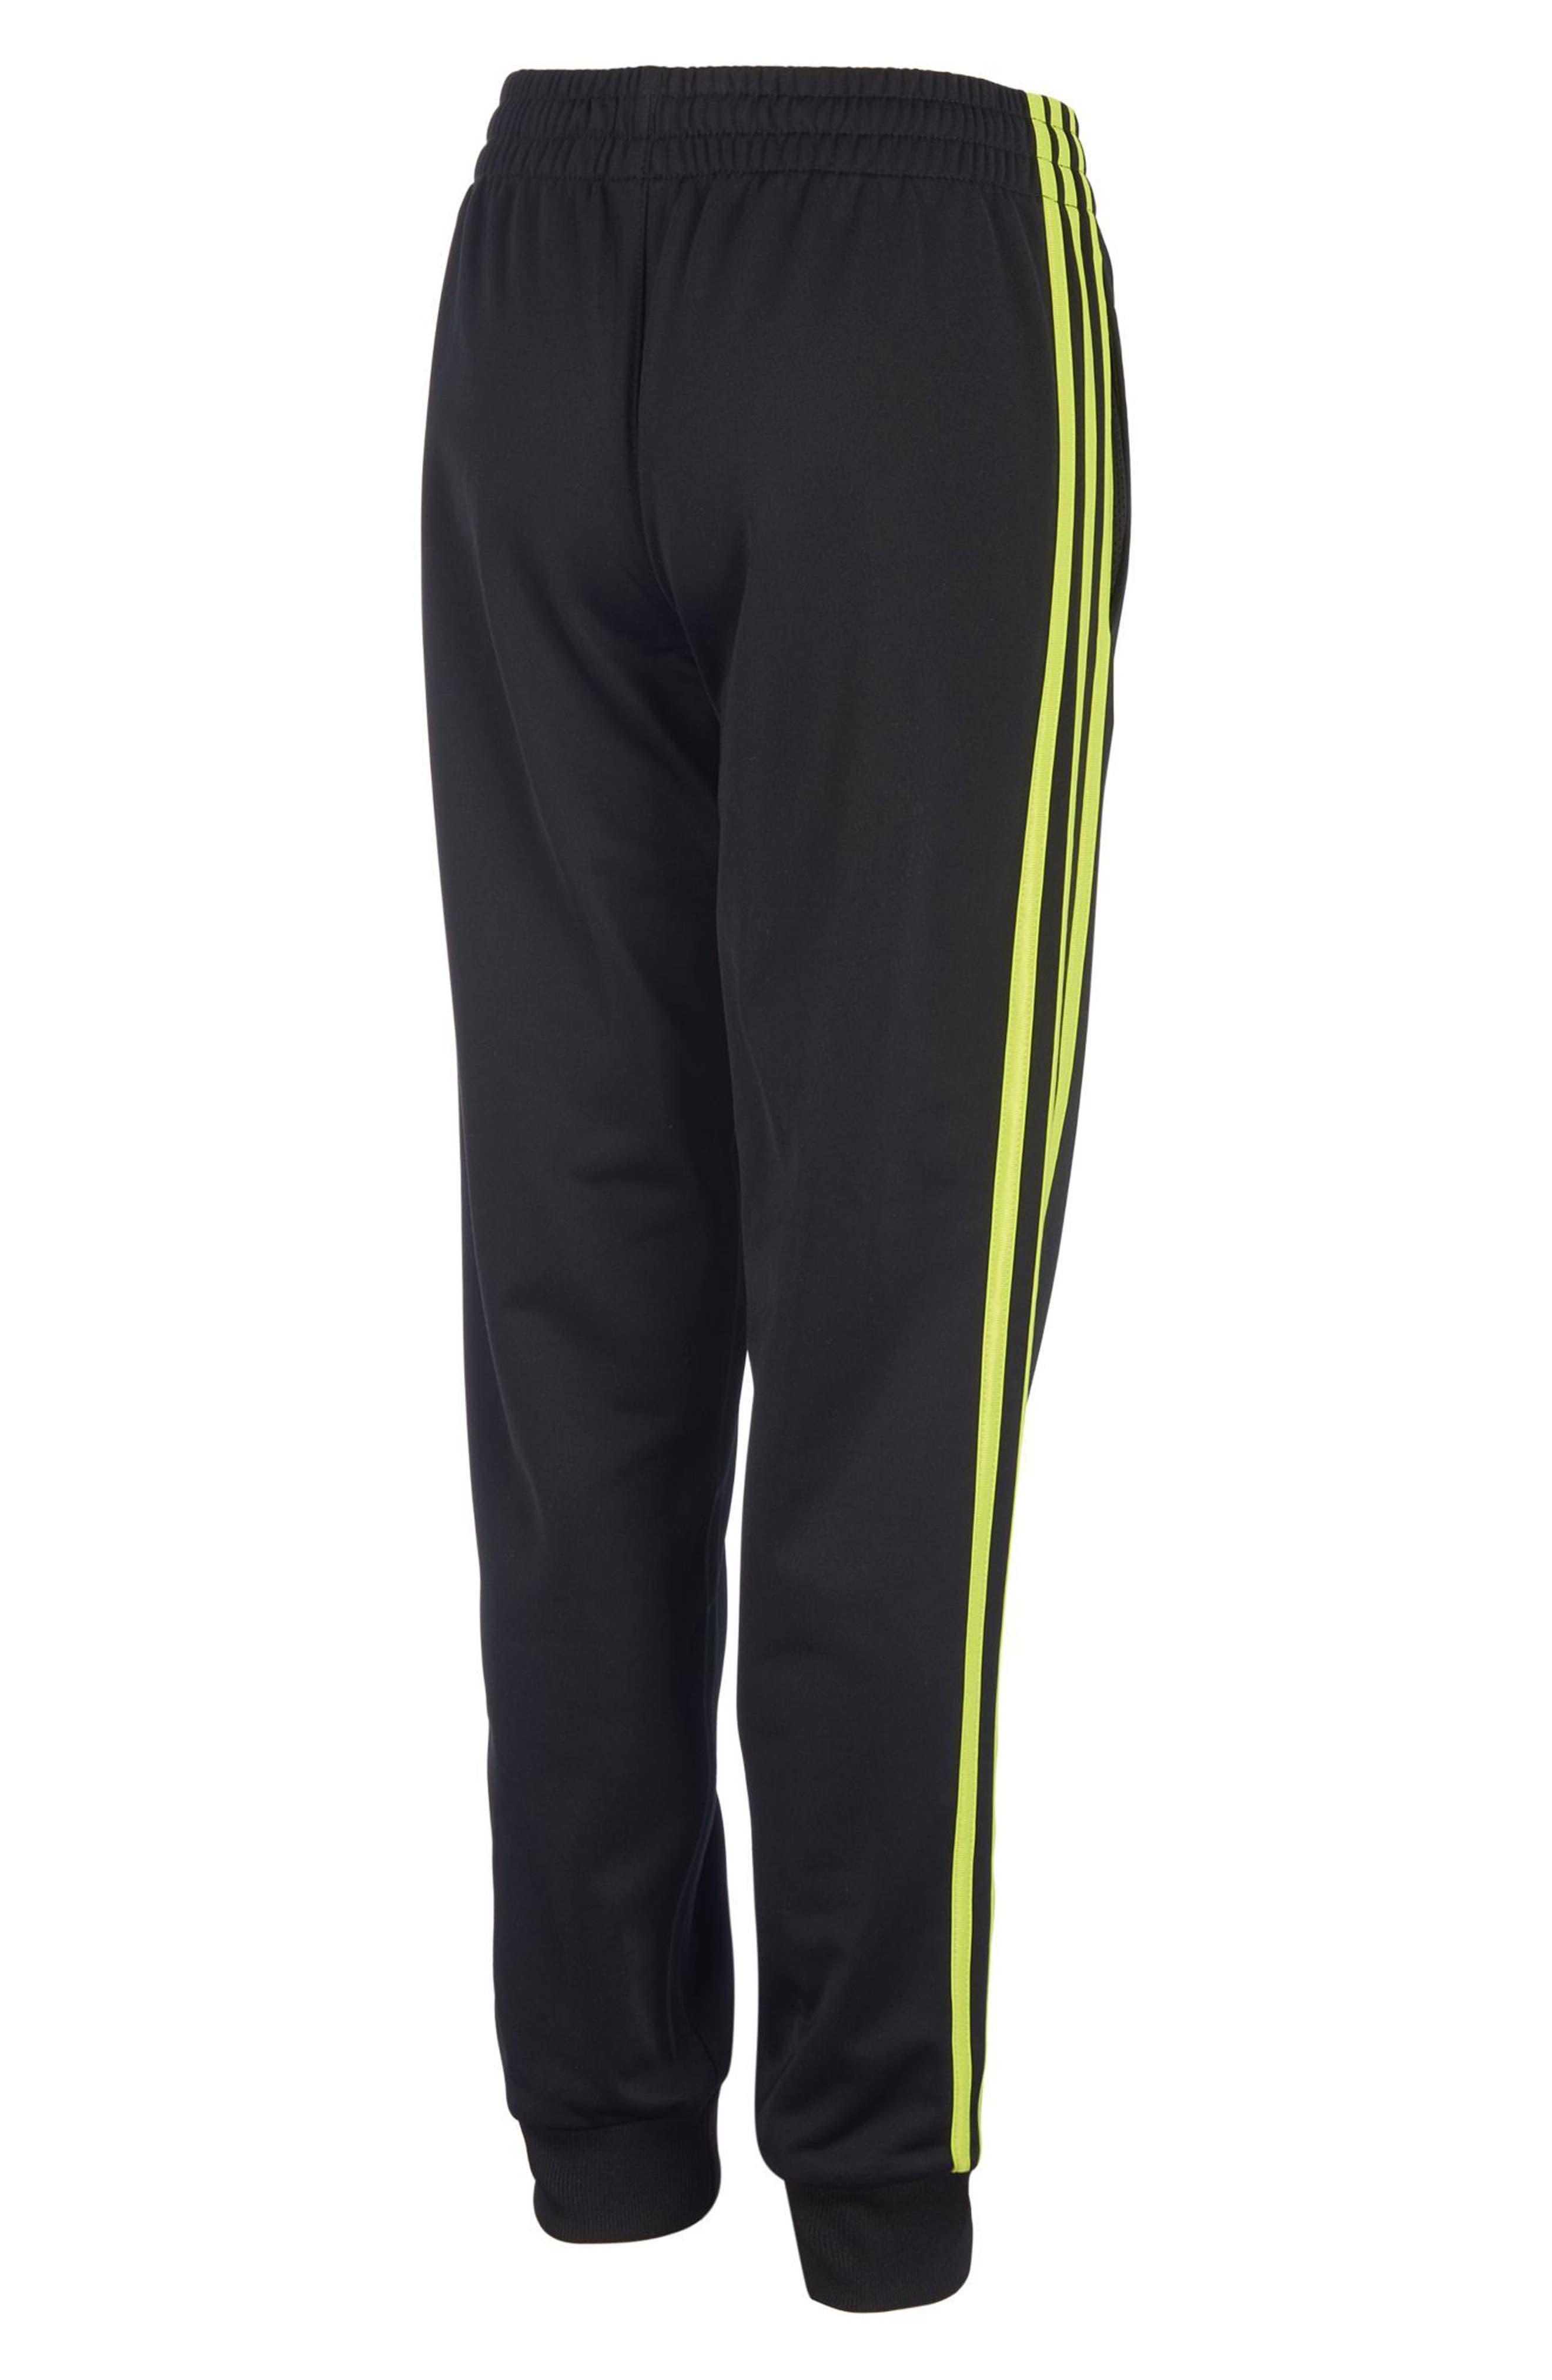 Iconic Jogger Pants,                             Alternate thumbnail 2, color,                             019